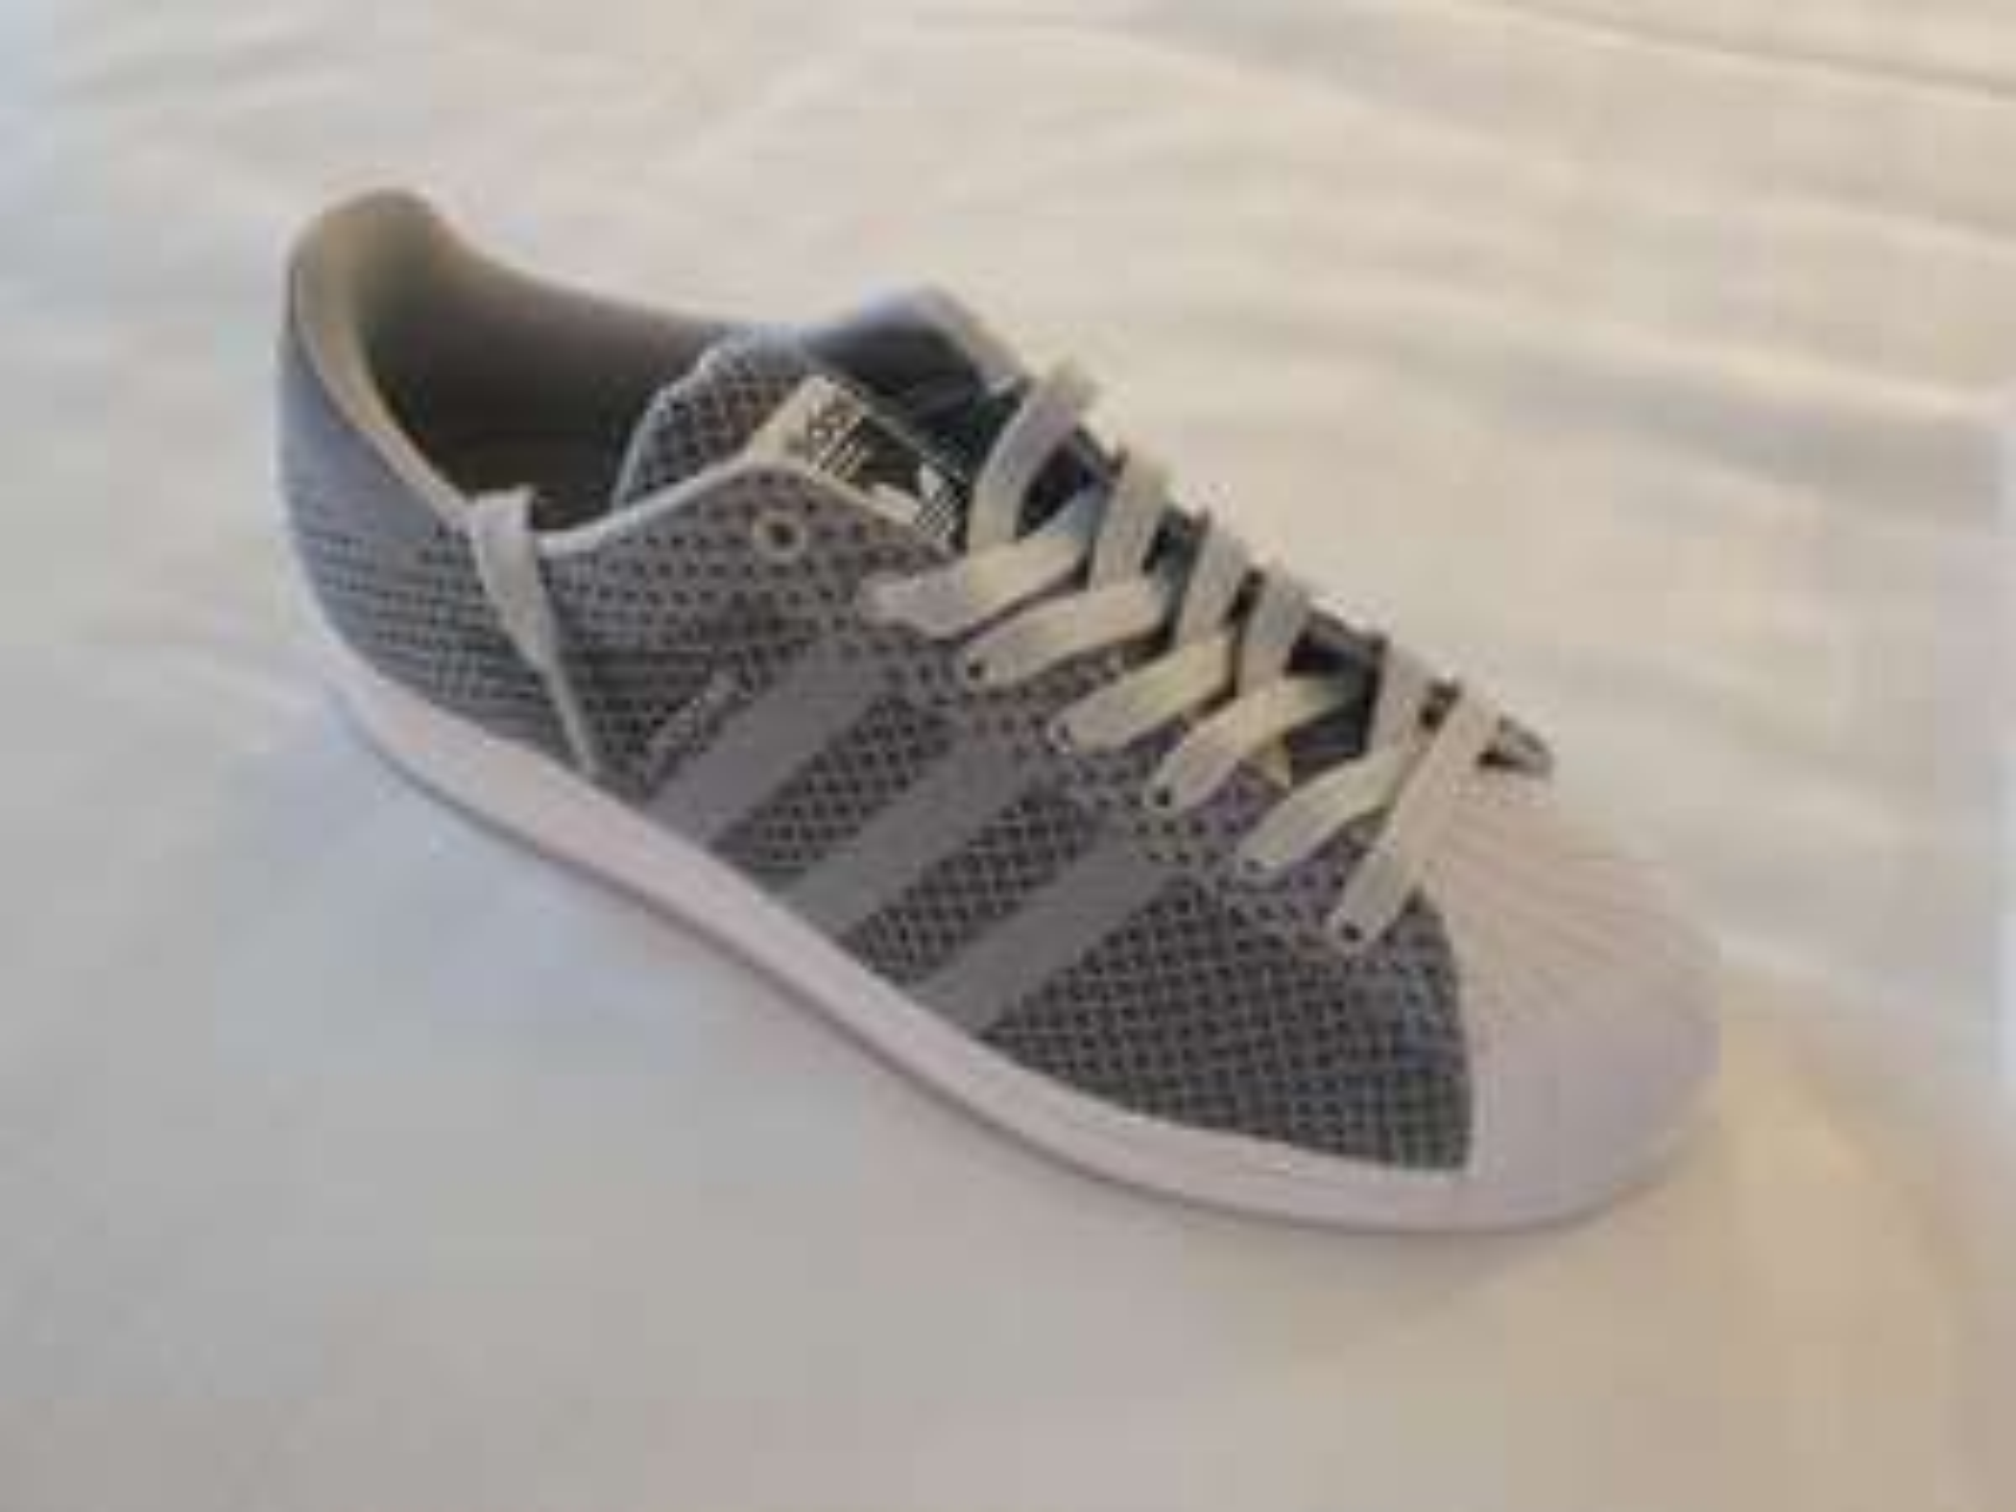 Adidas Superstars trainers £40 at JD Sports Edinburgh